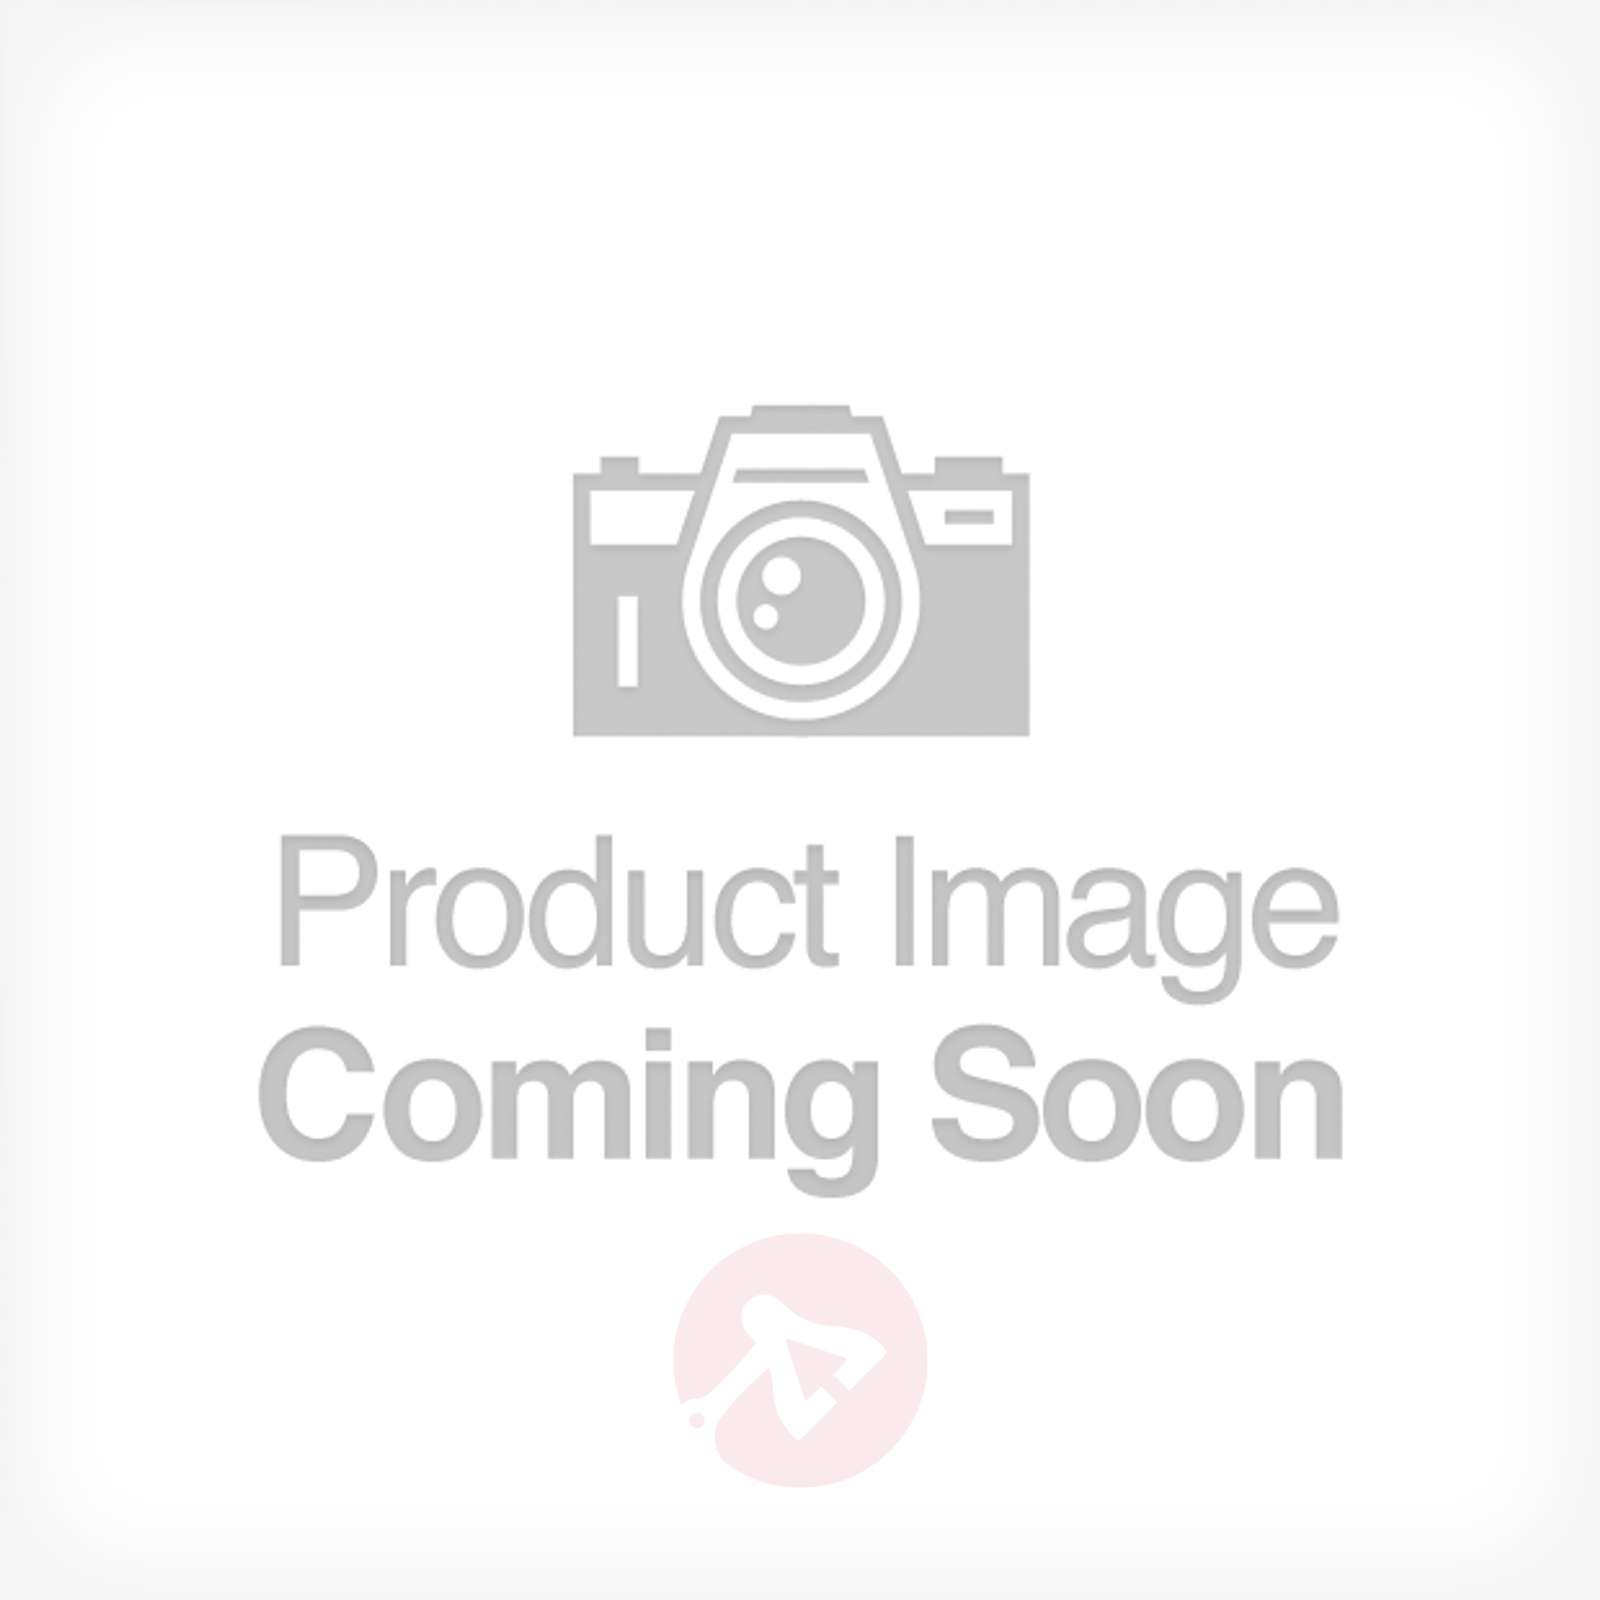 Cristallo Wall Light-3003230-01